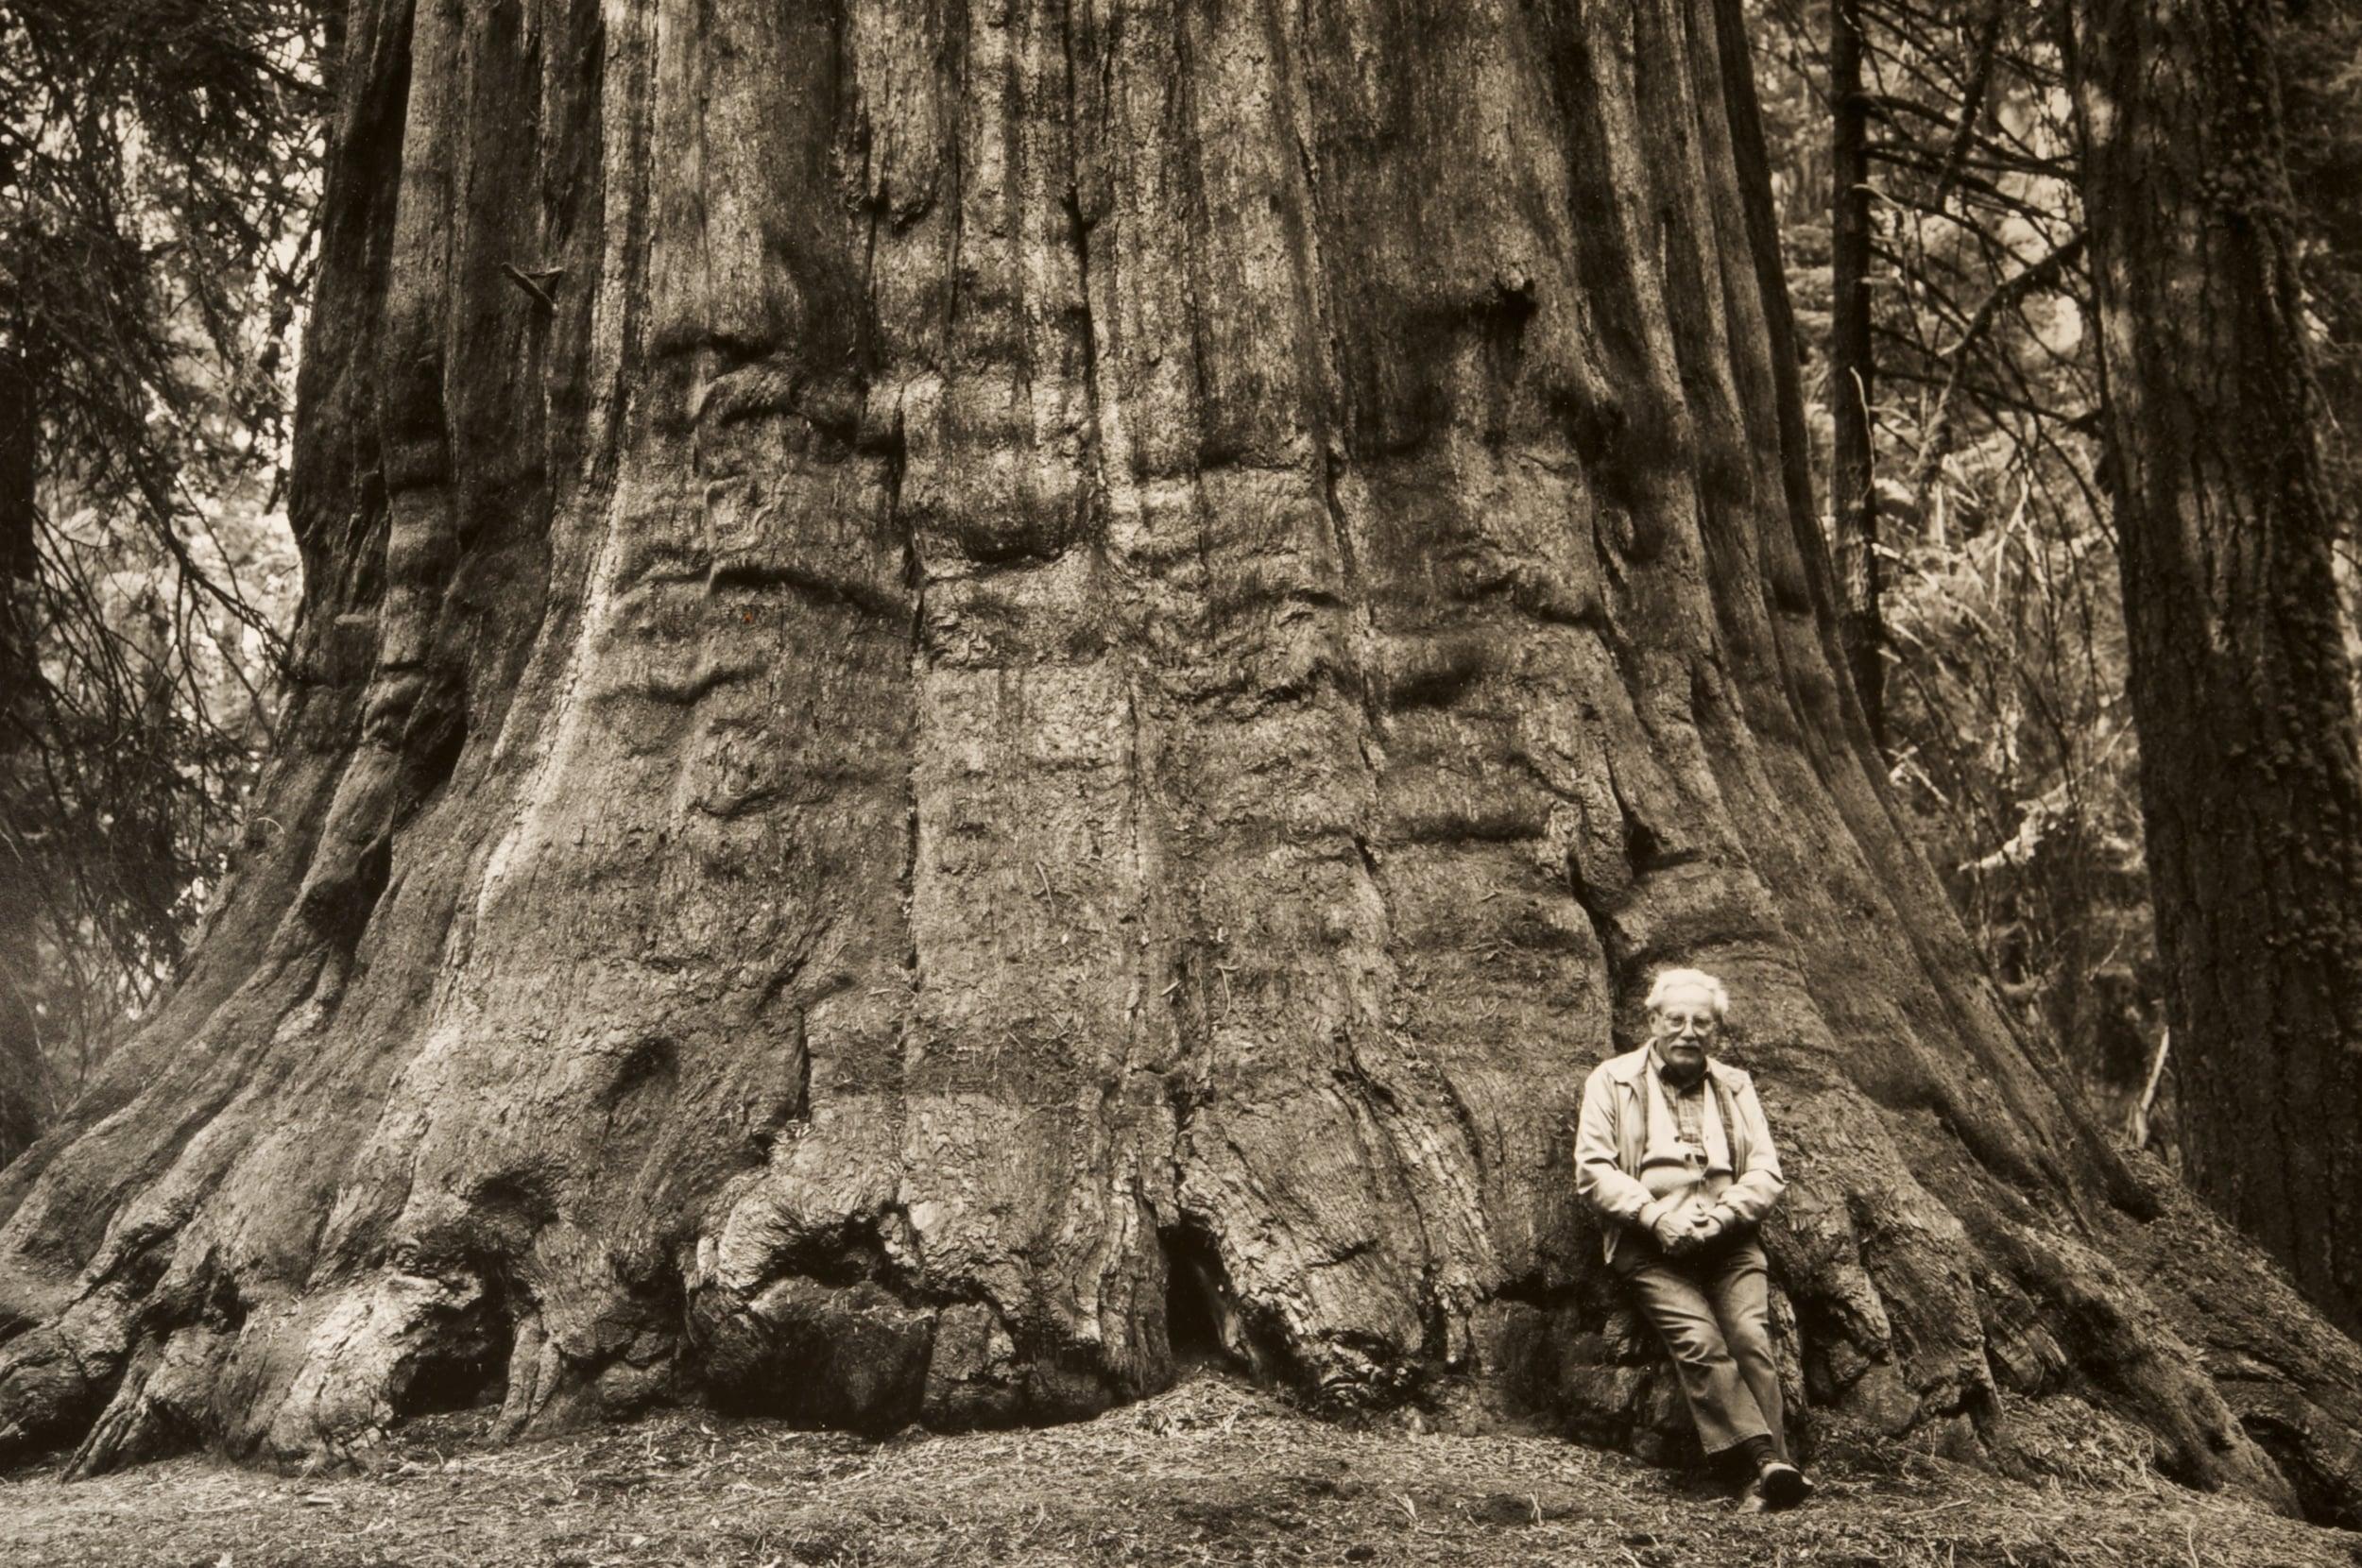 Stan Jorstad with Grizzly Giant. Photograph by Steve Jorstad.